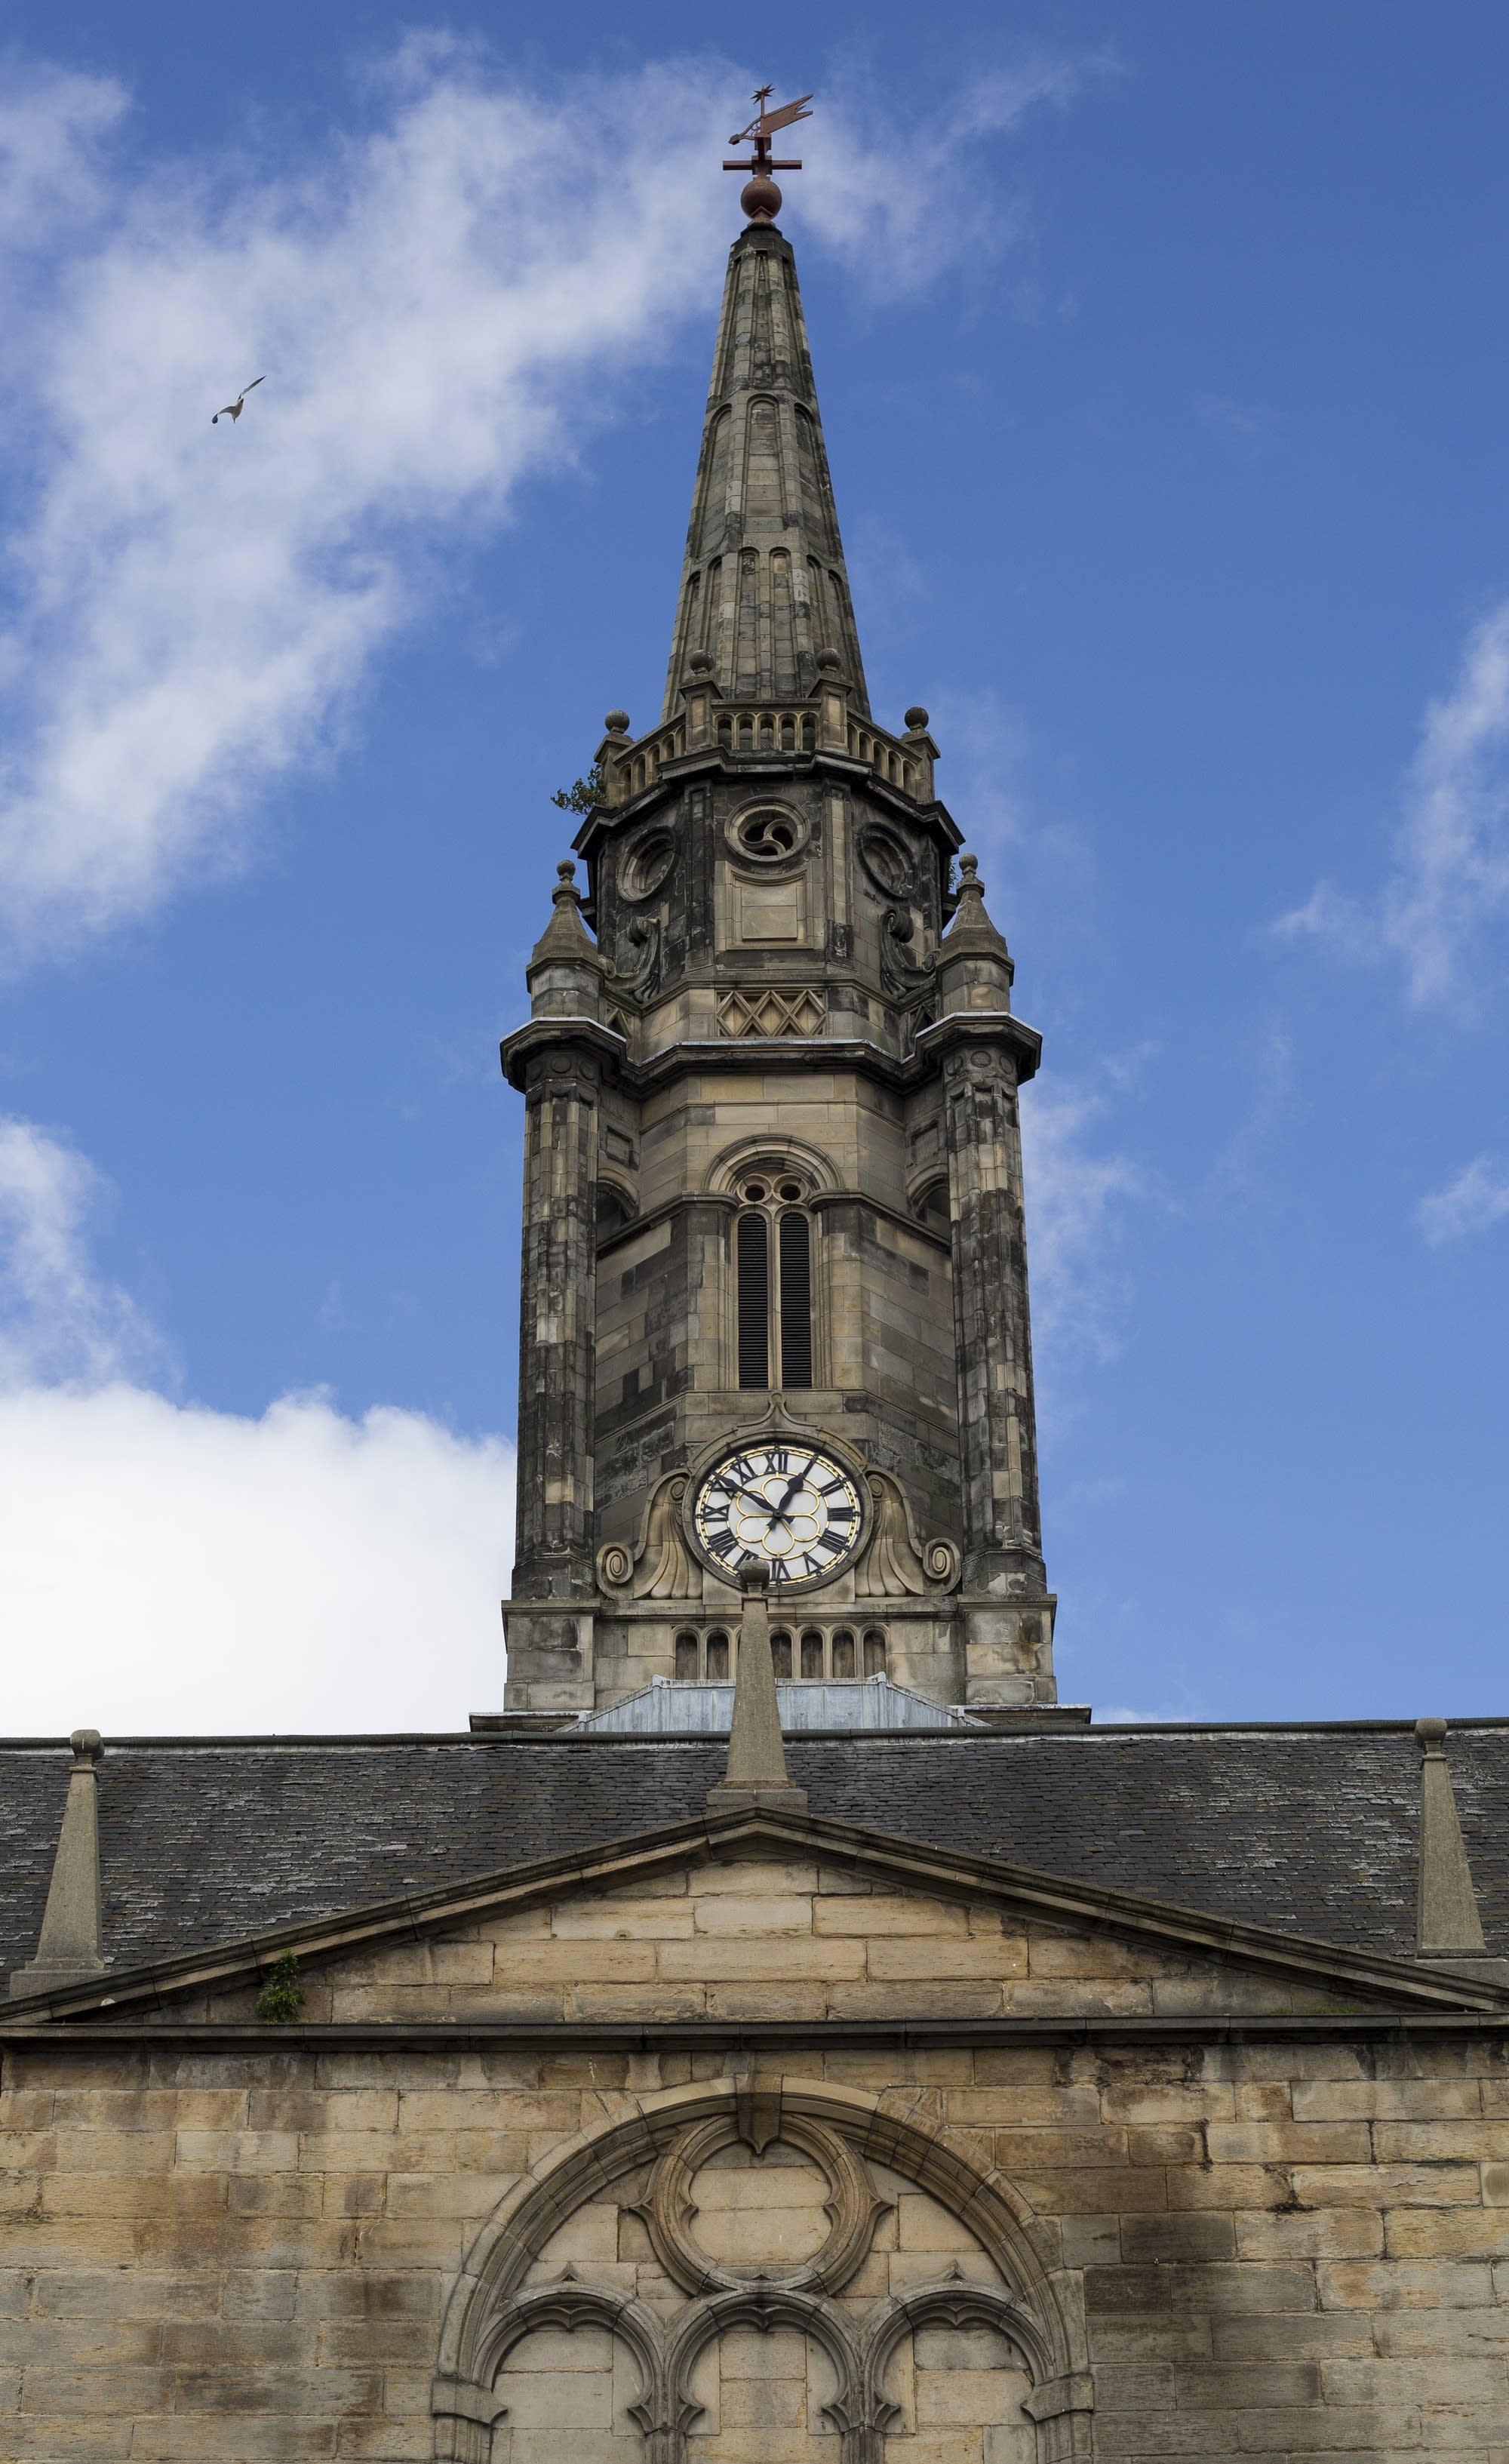 Edinburgh - 40 - Clock tower